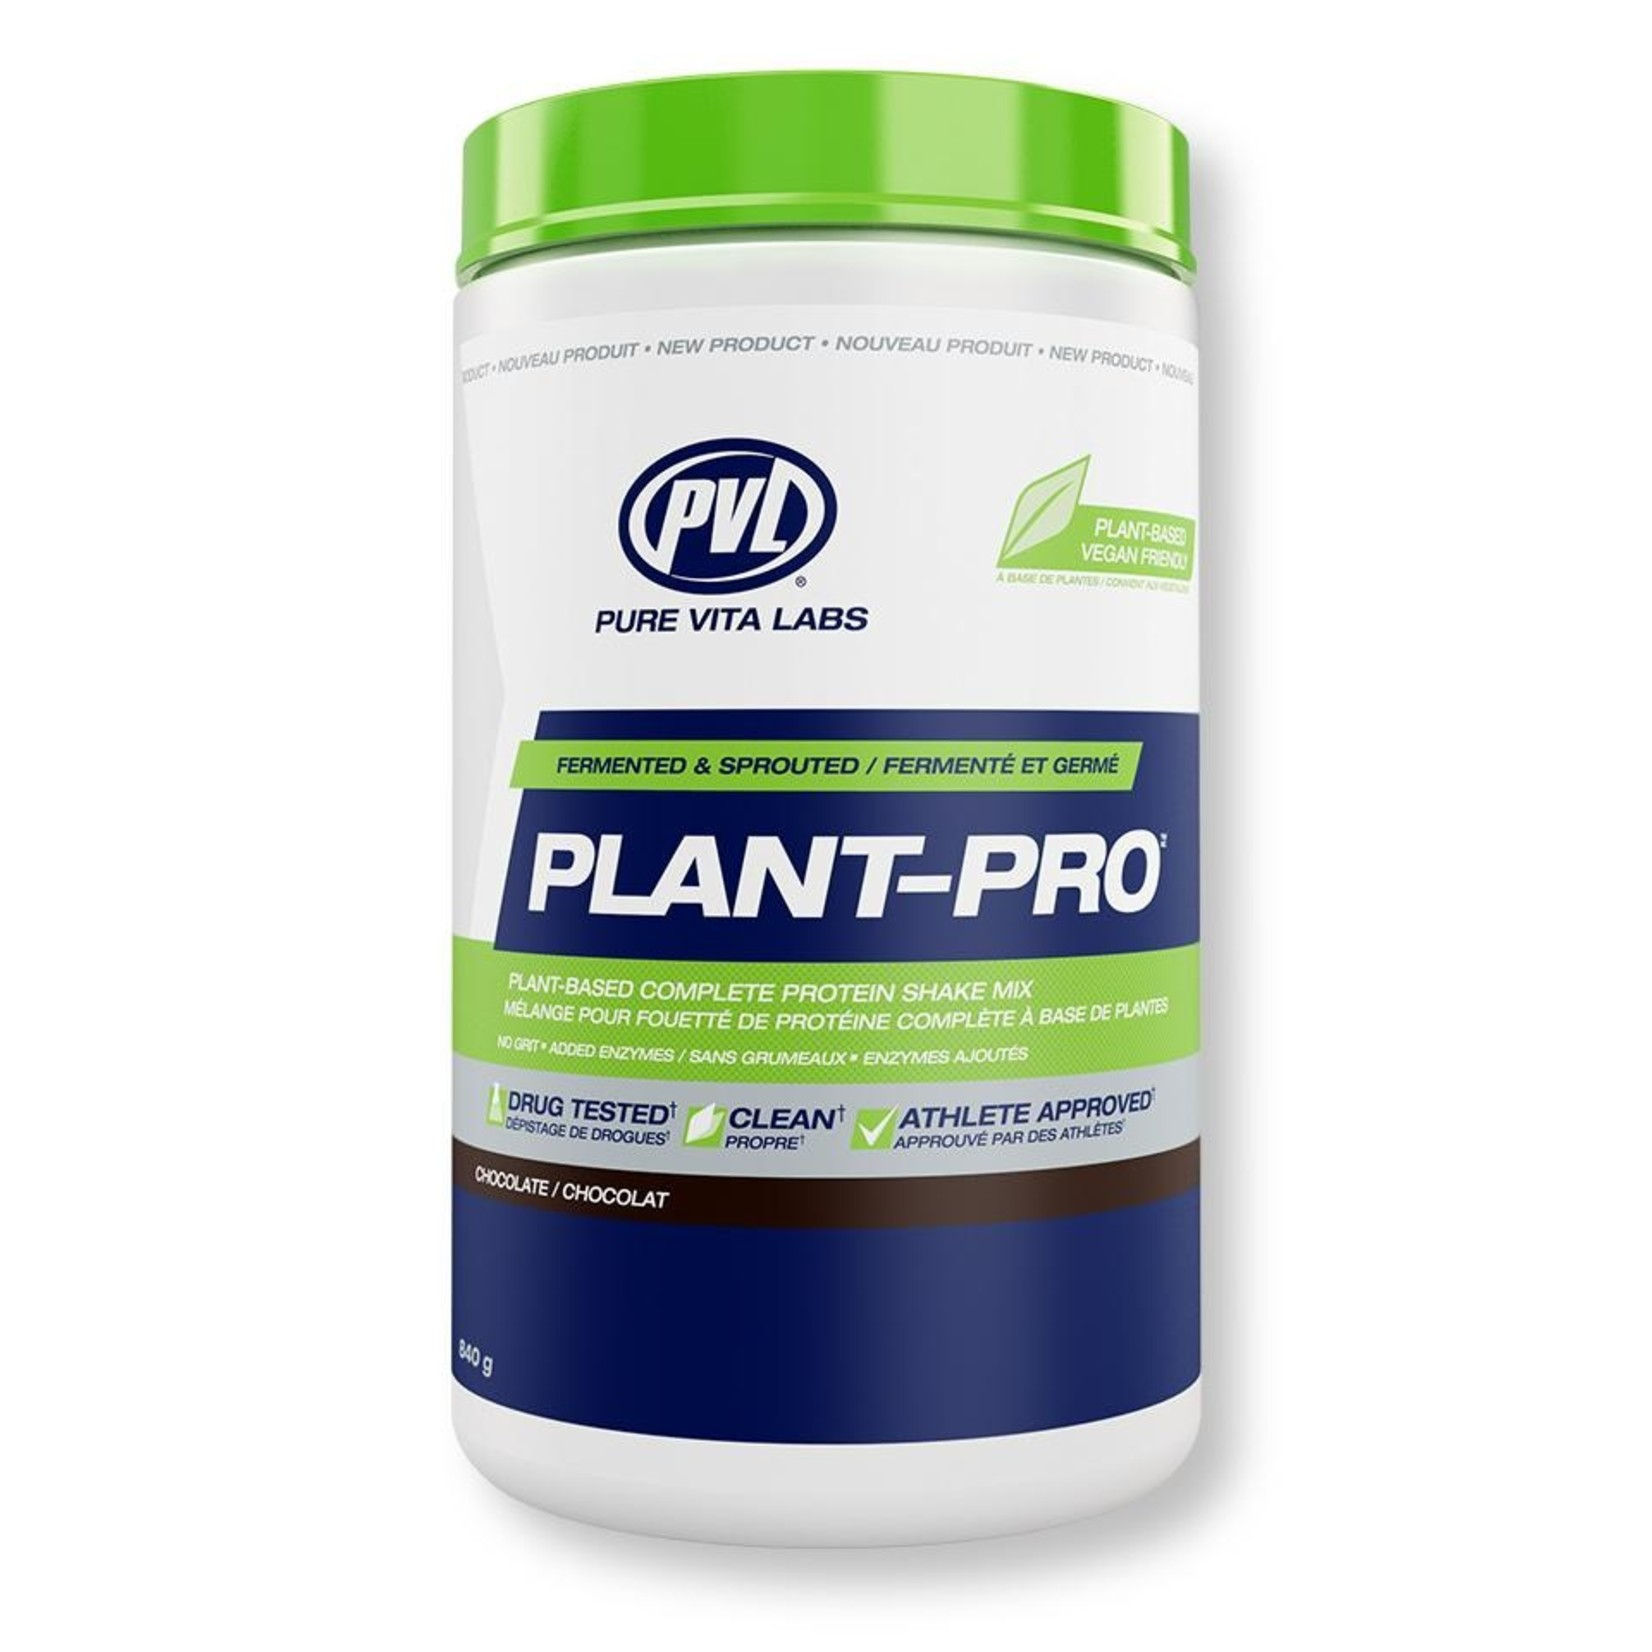 Pure Vita Labs Plant Pro Vegan Protein Chocolate 840g